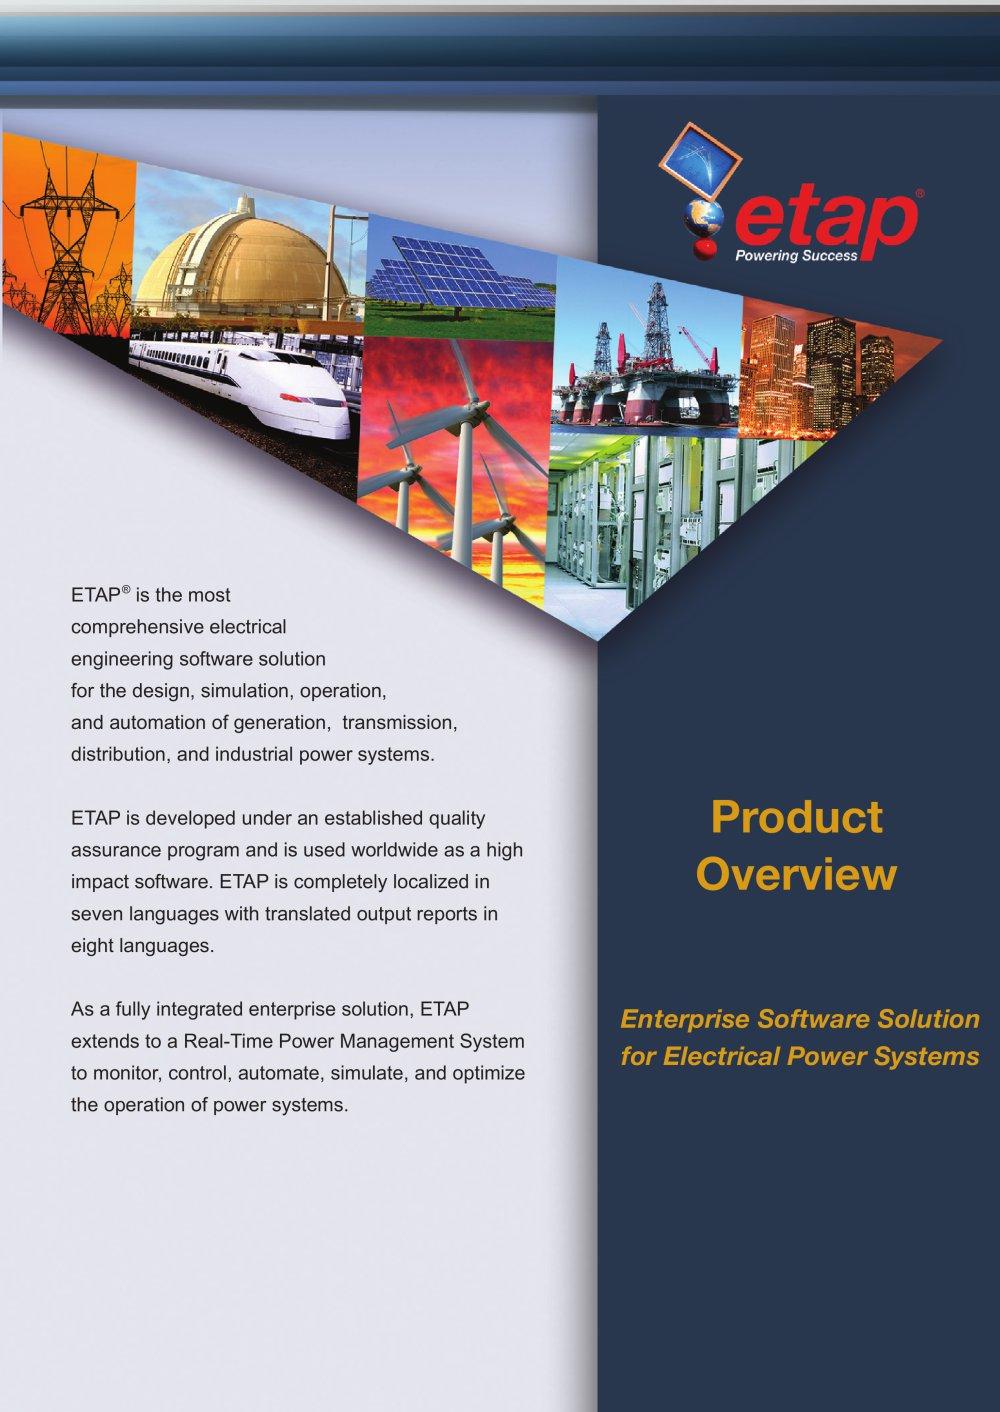 enterprise software solution for electrical power systems etap